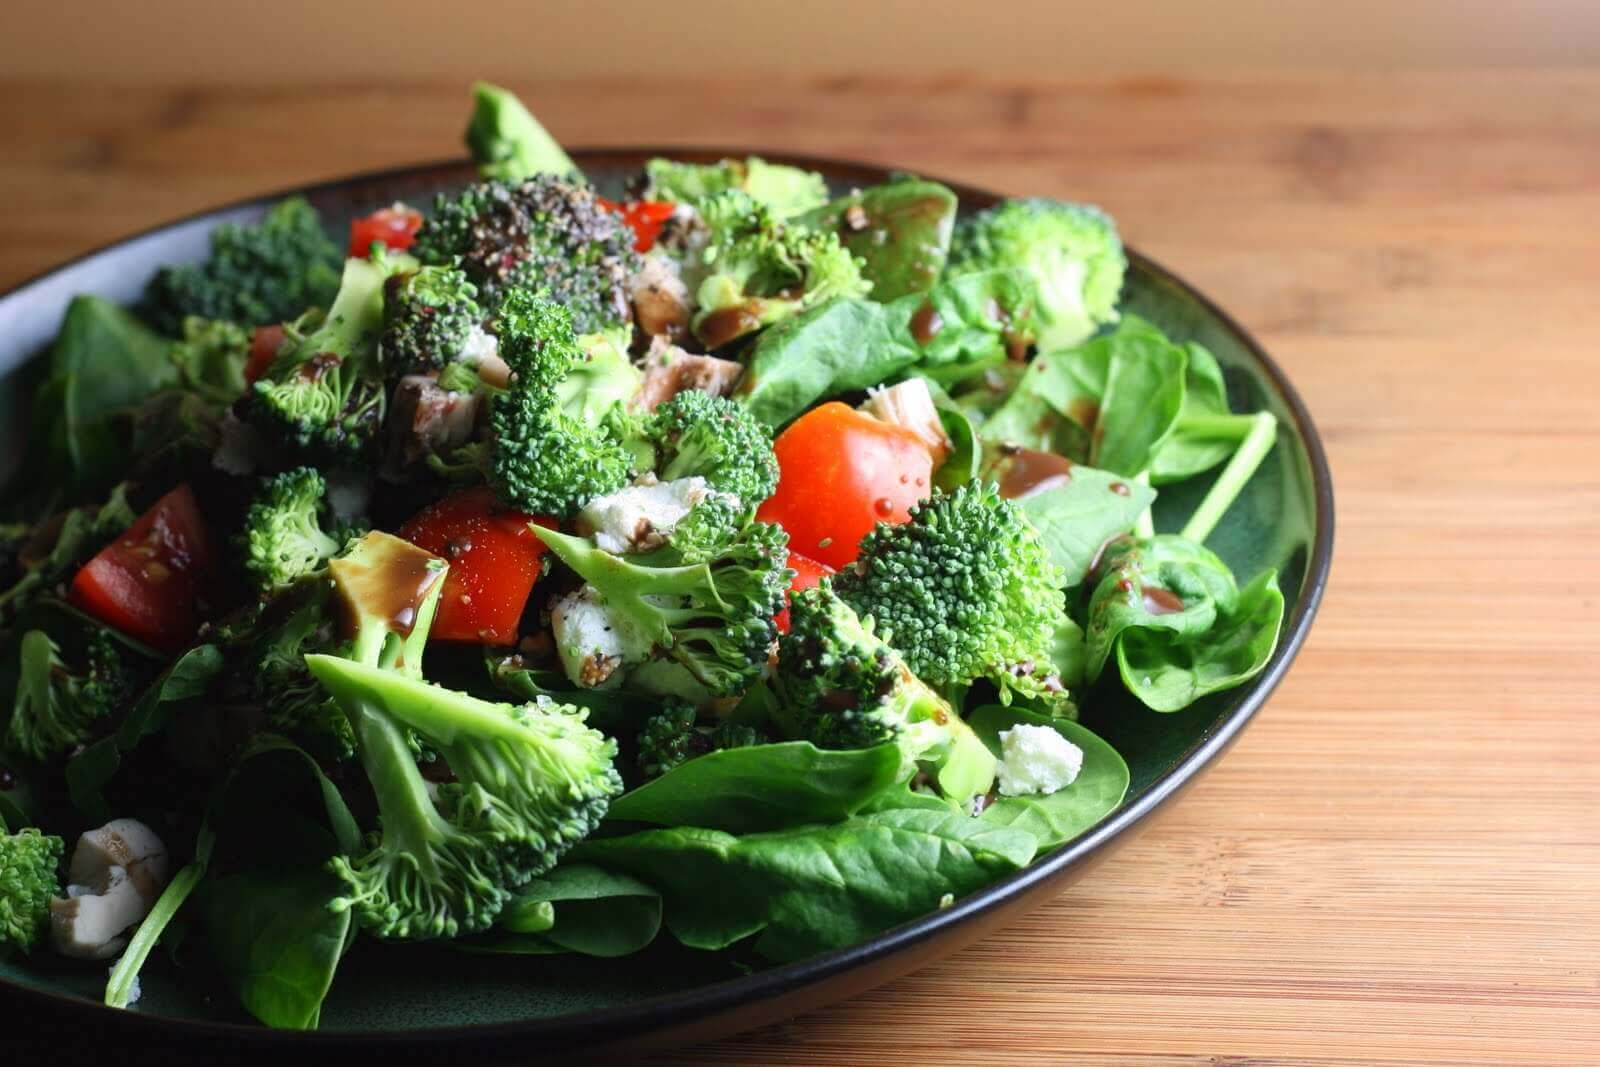 Ensalada de brocoli.